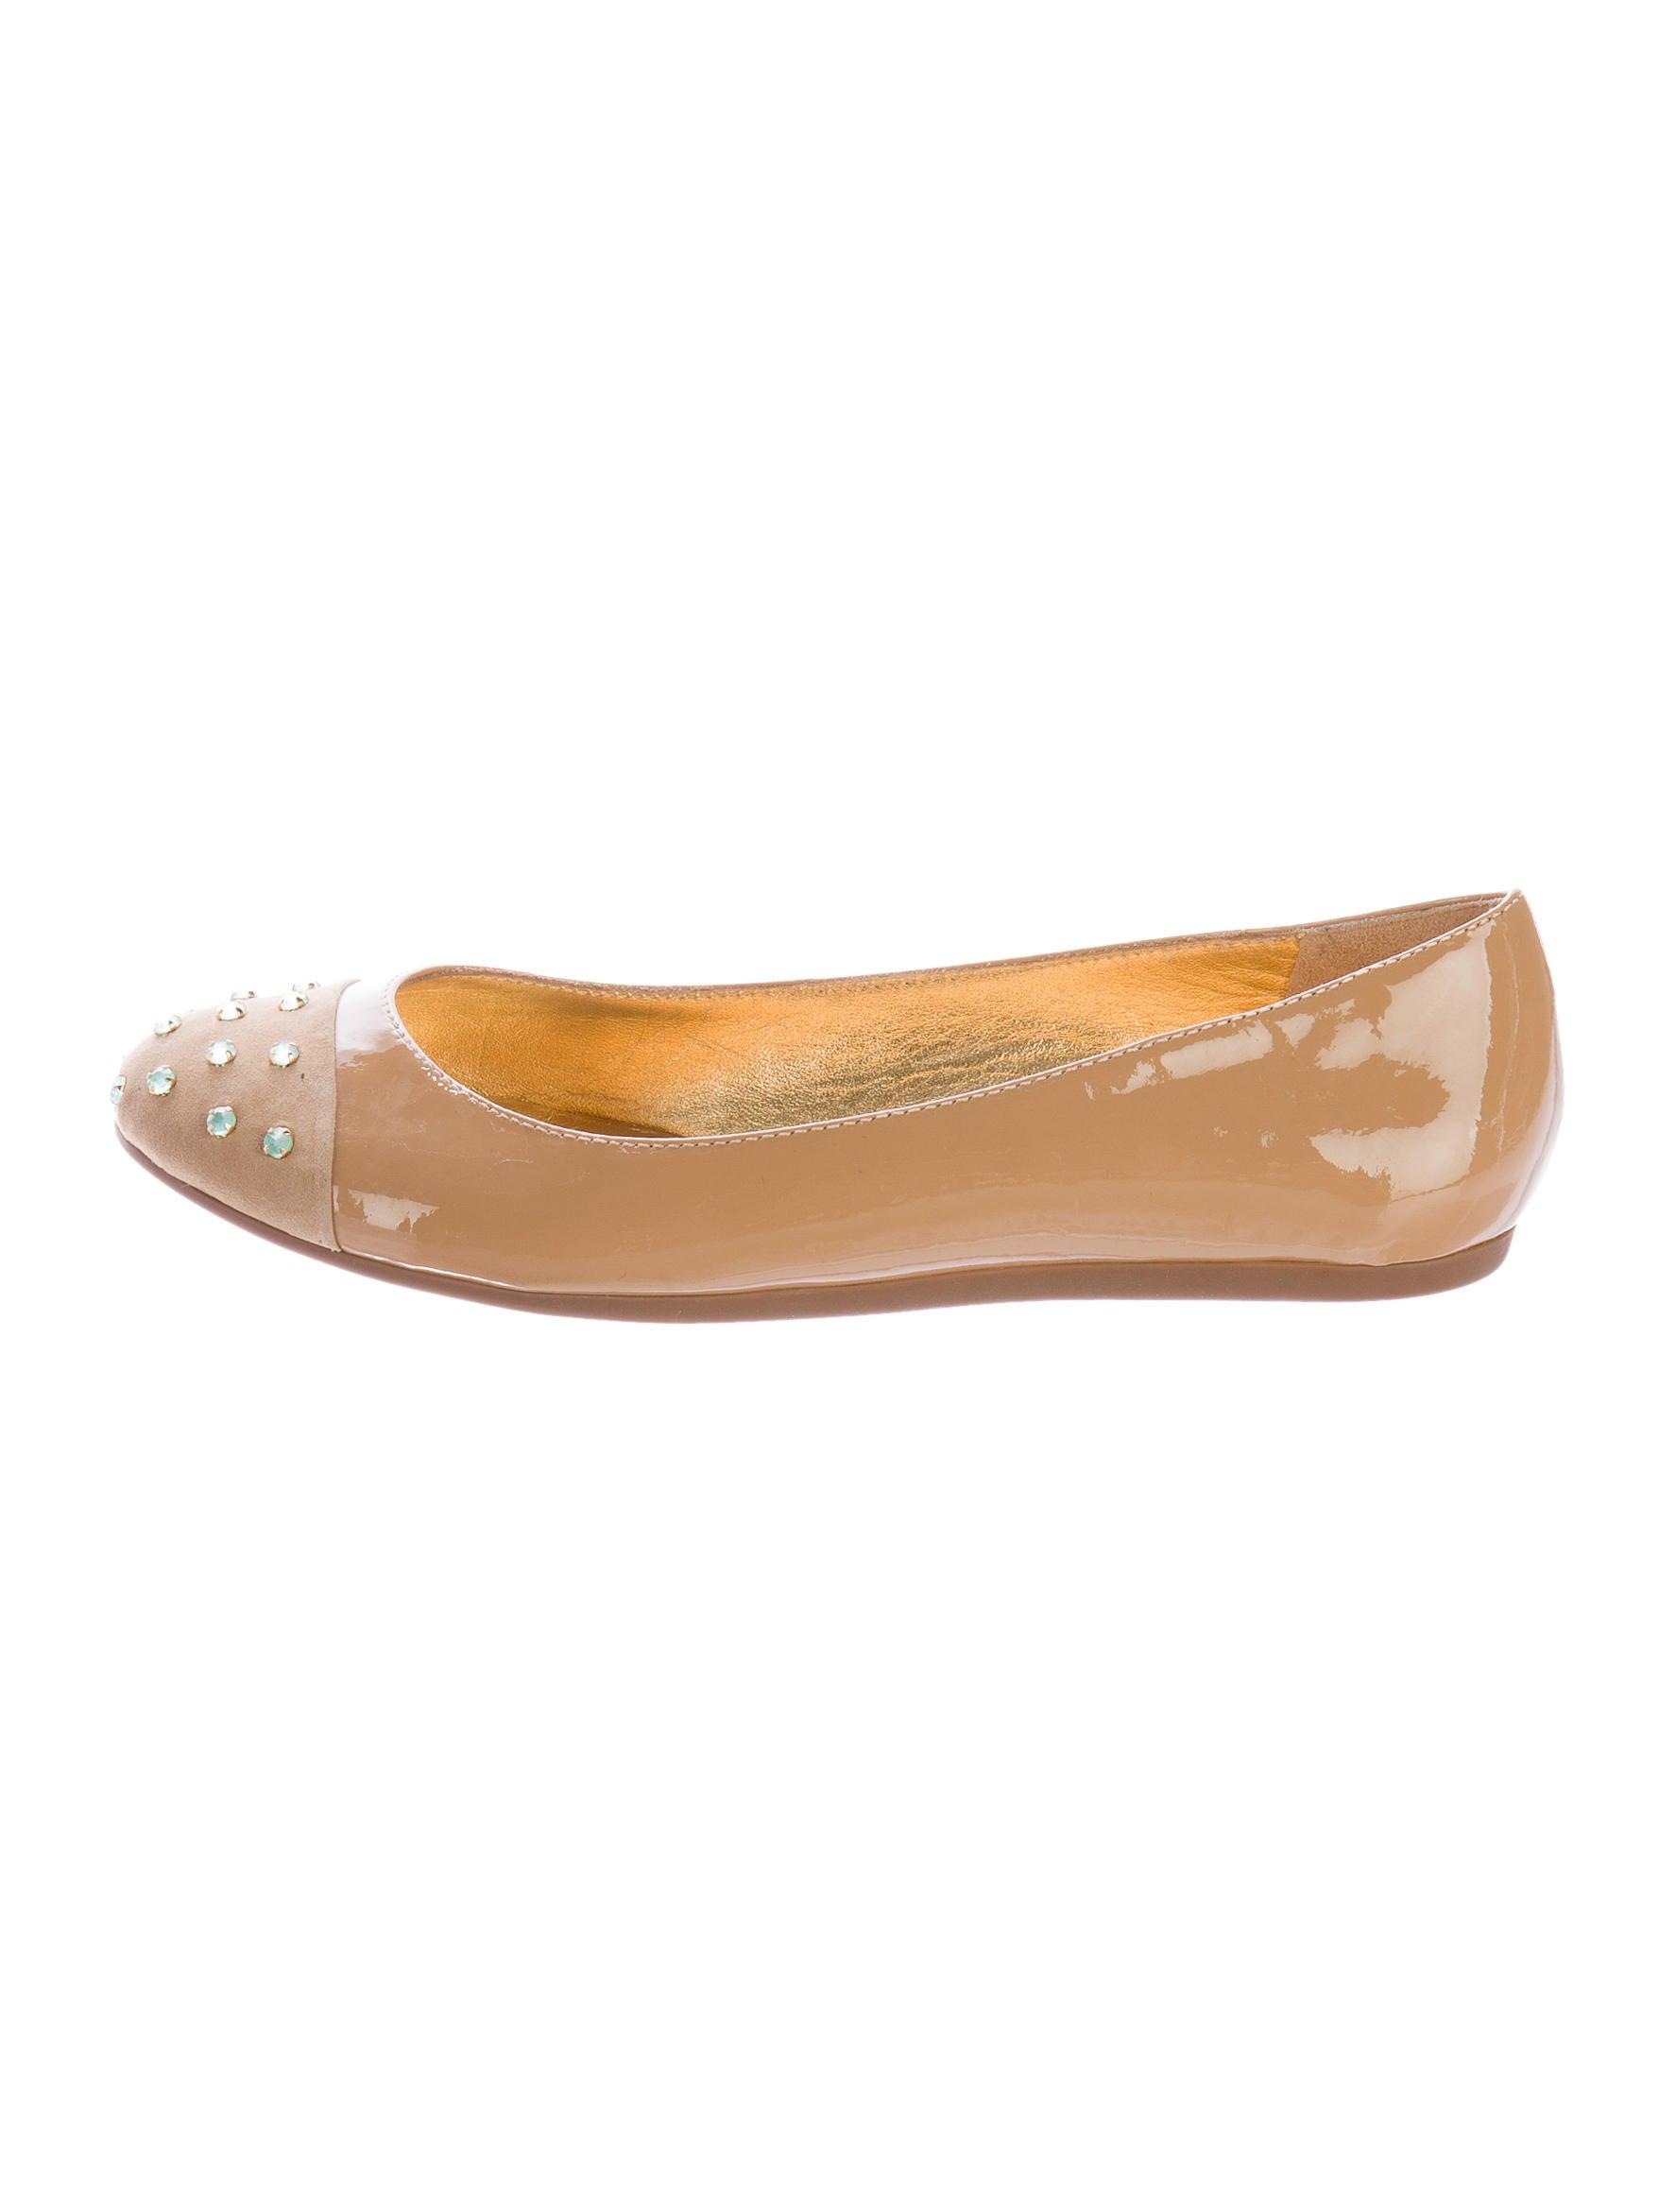 Kate spade new york patent leather cap toe flats shoes for Kate spade new york flats